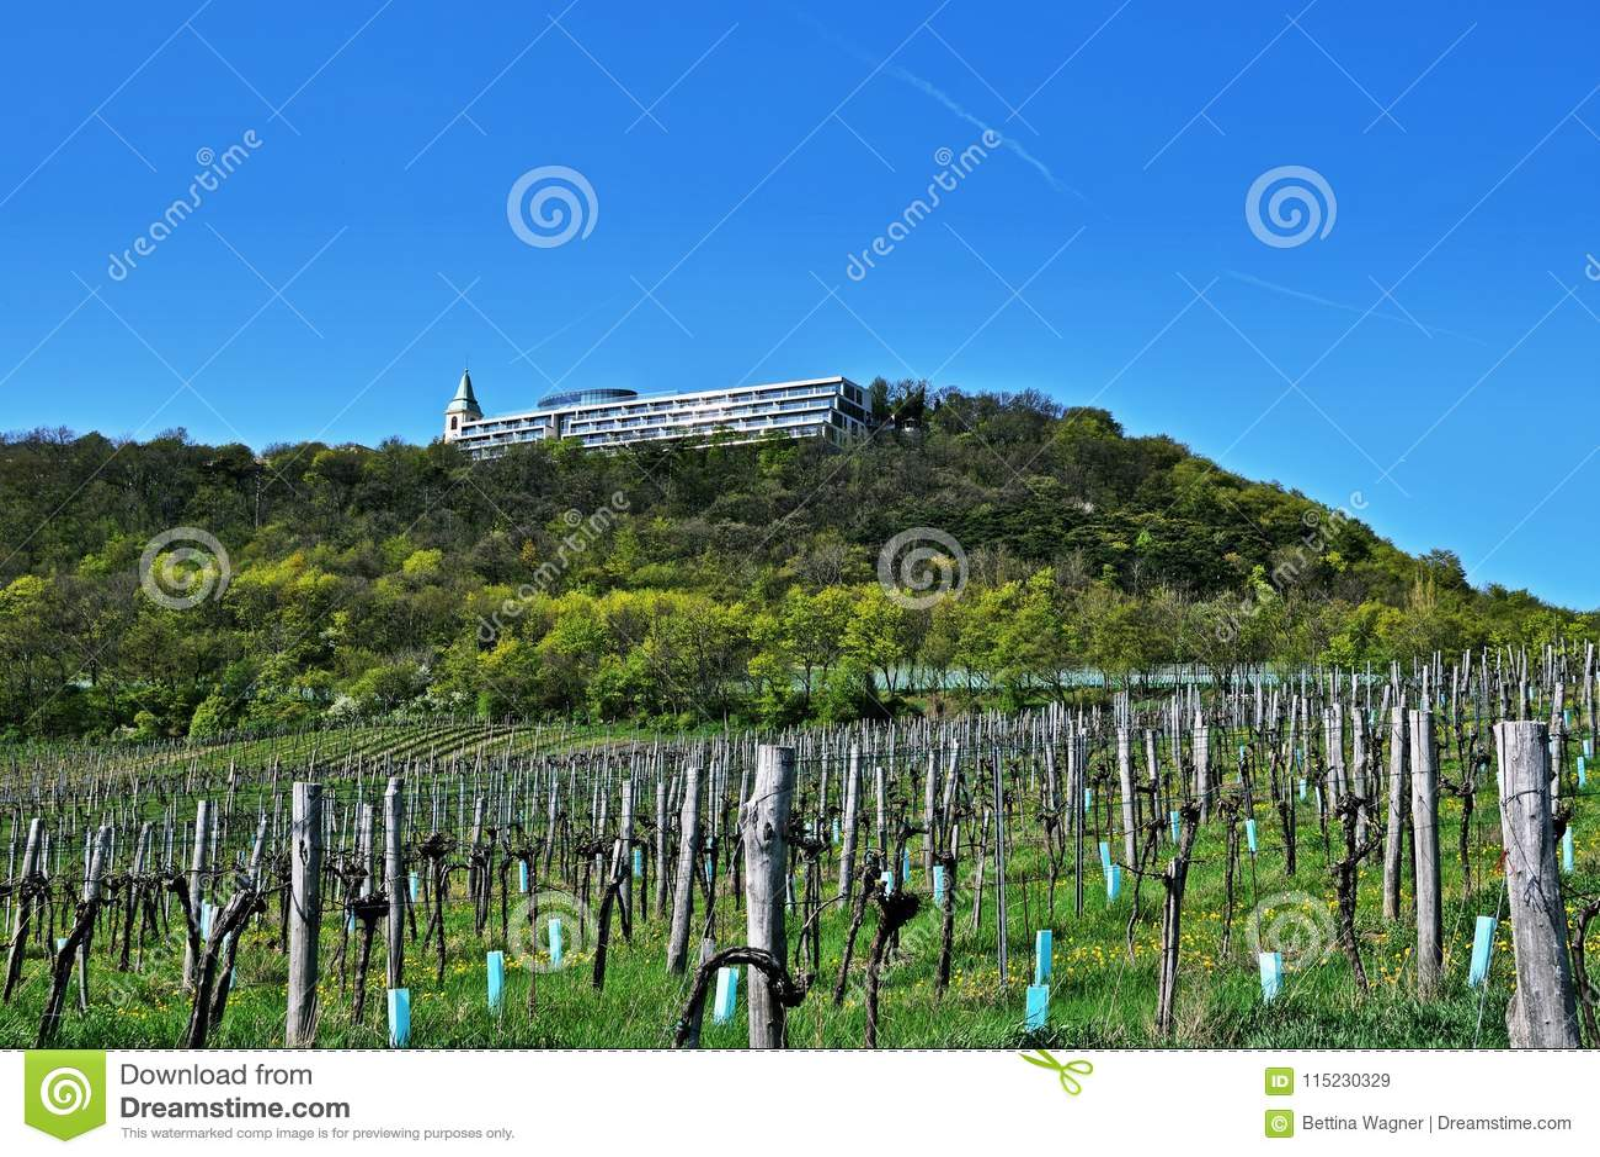 Vineyards Near Kahlenberg Wien Stock Image Image Of Color Hill